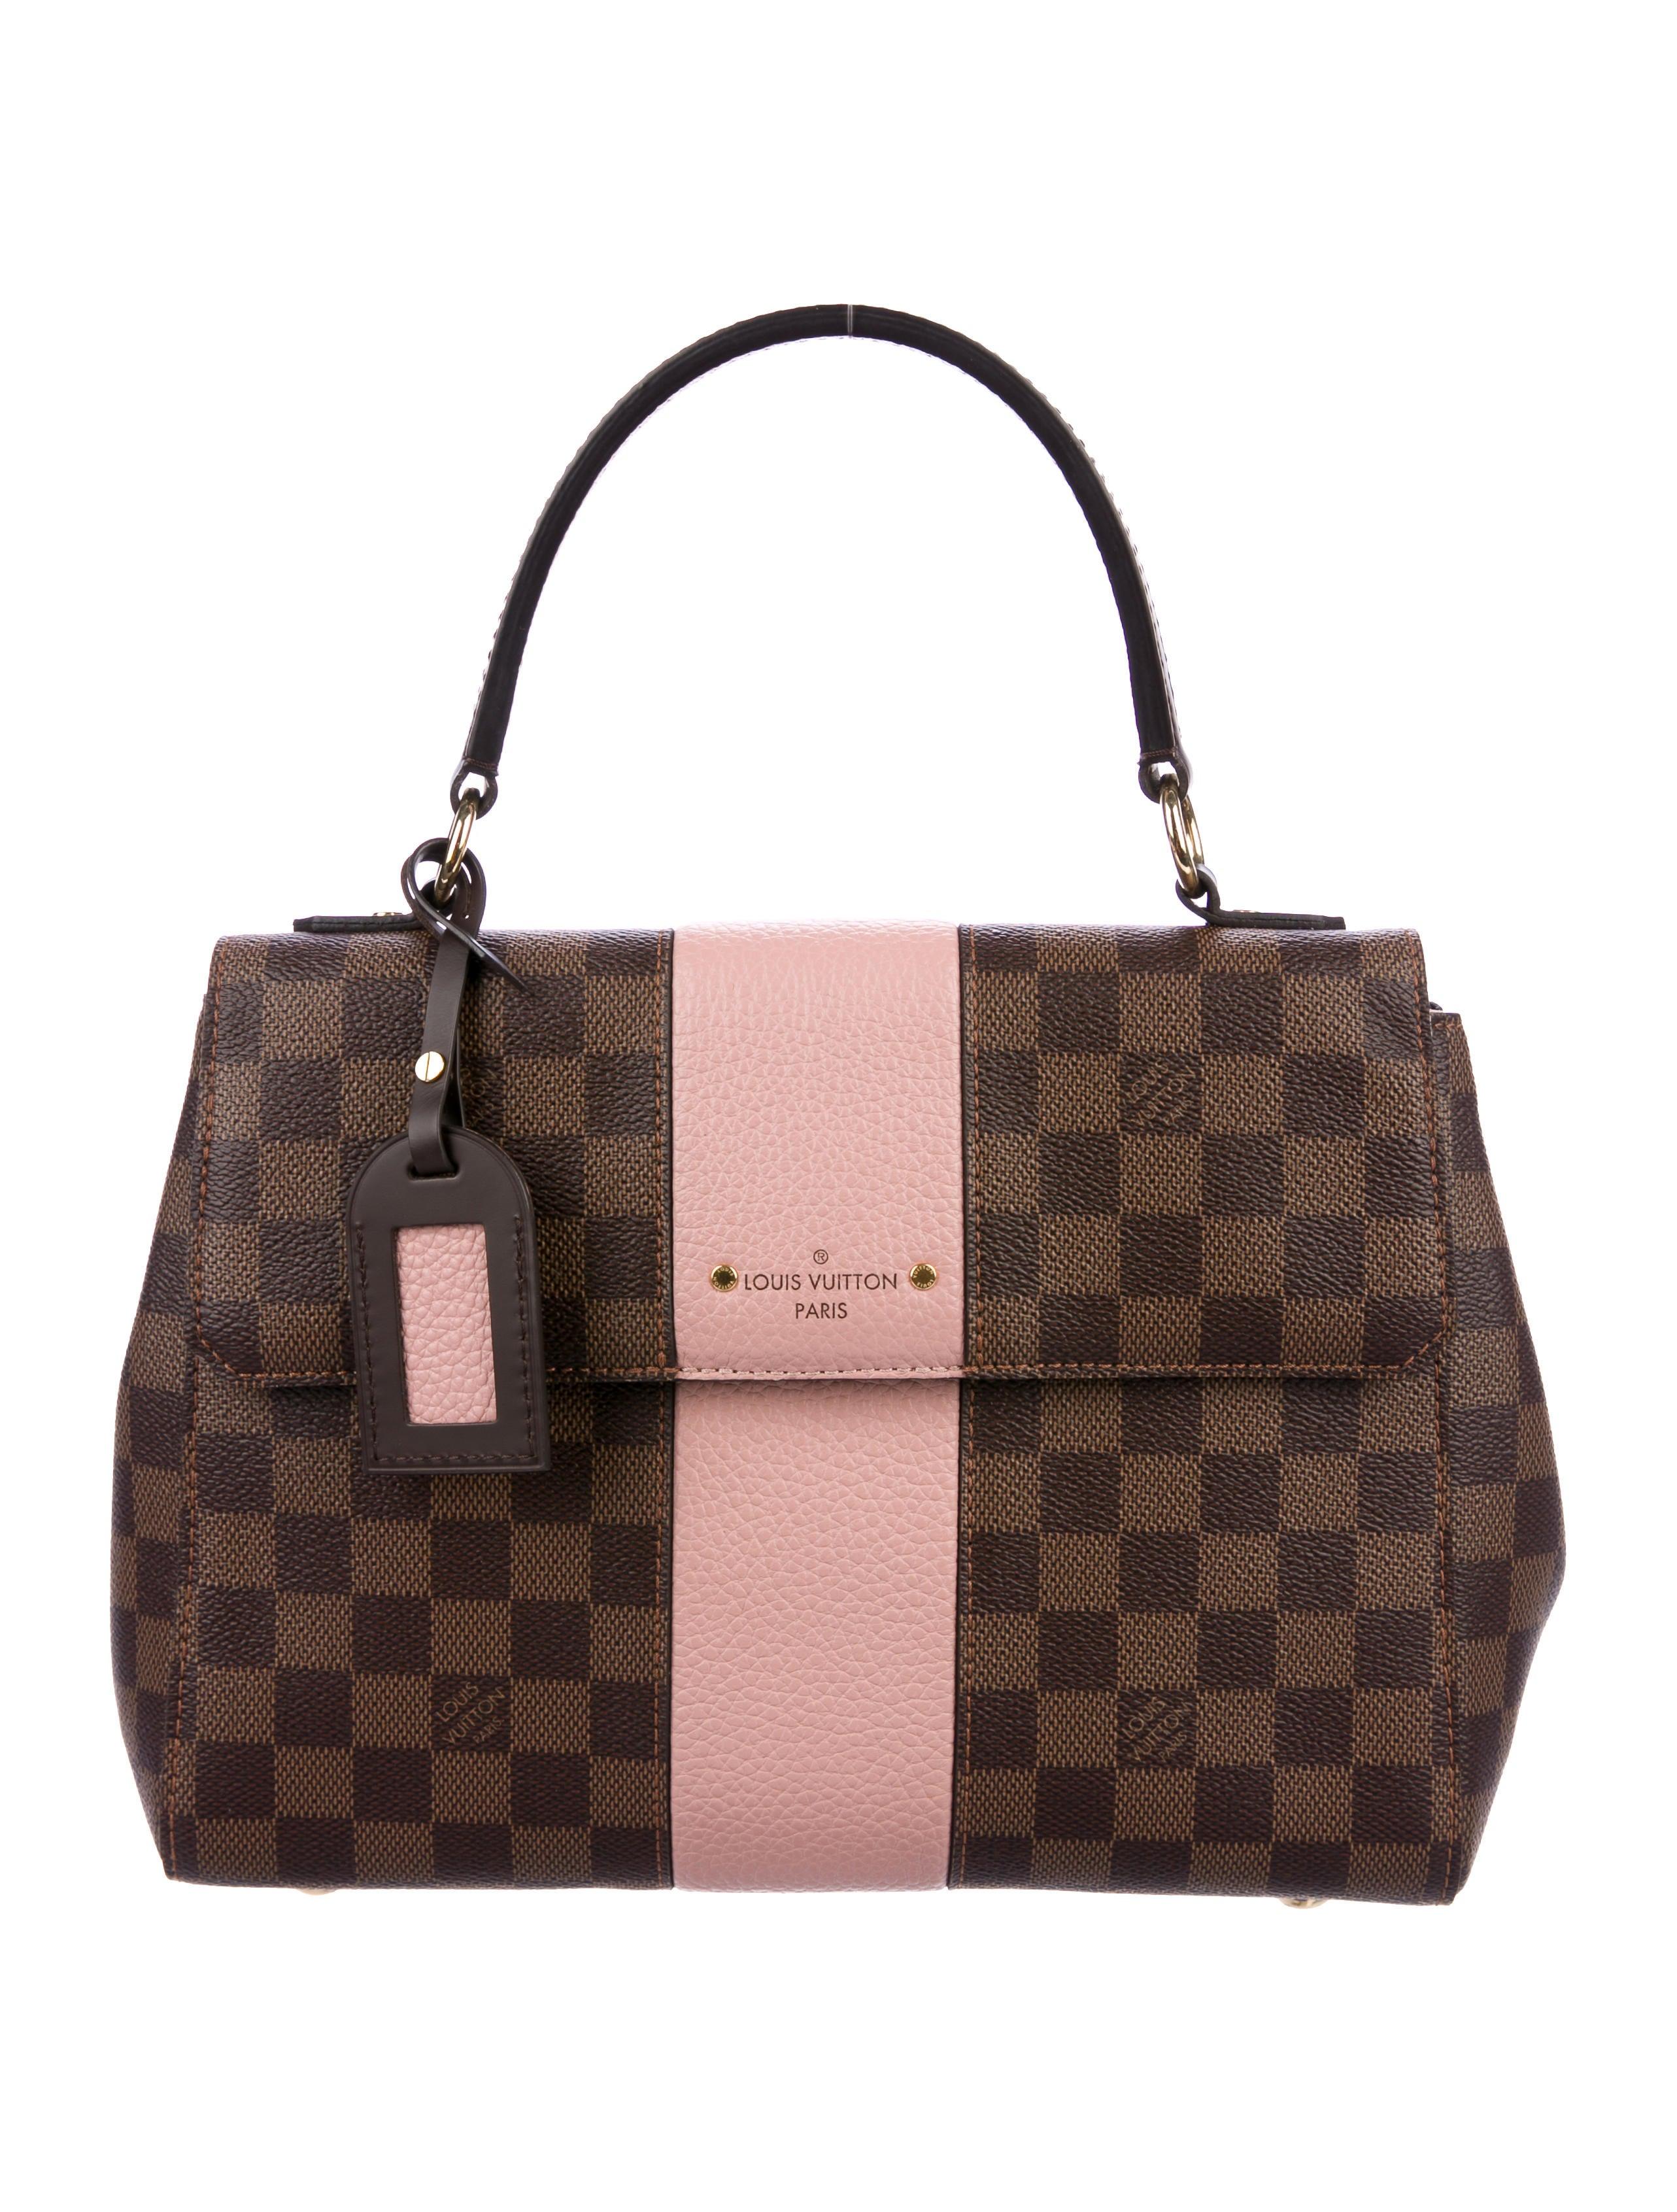 dc0221f60bf1 Louis Vuitton 2018 Damier Ebene Bond Street Satchel - Handbags ...